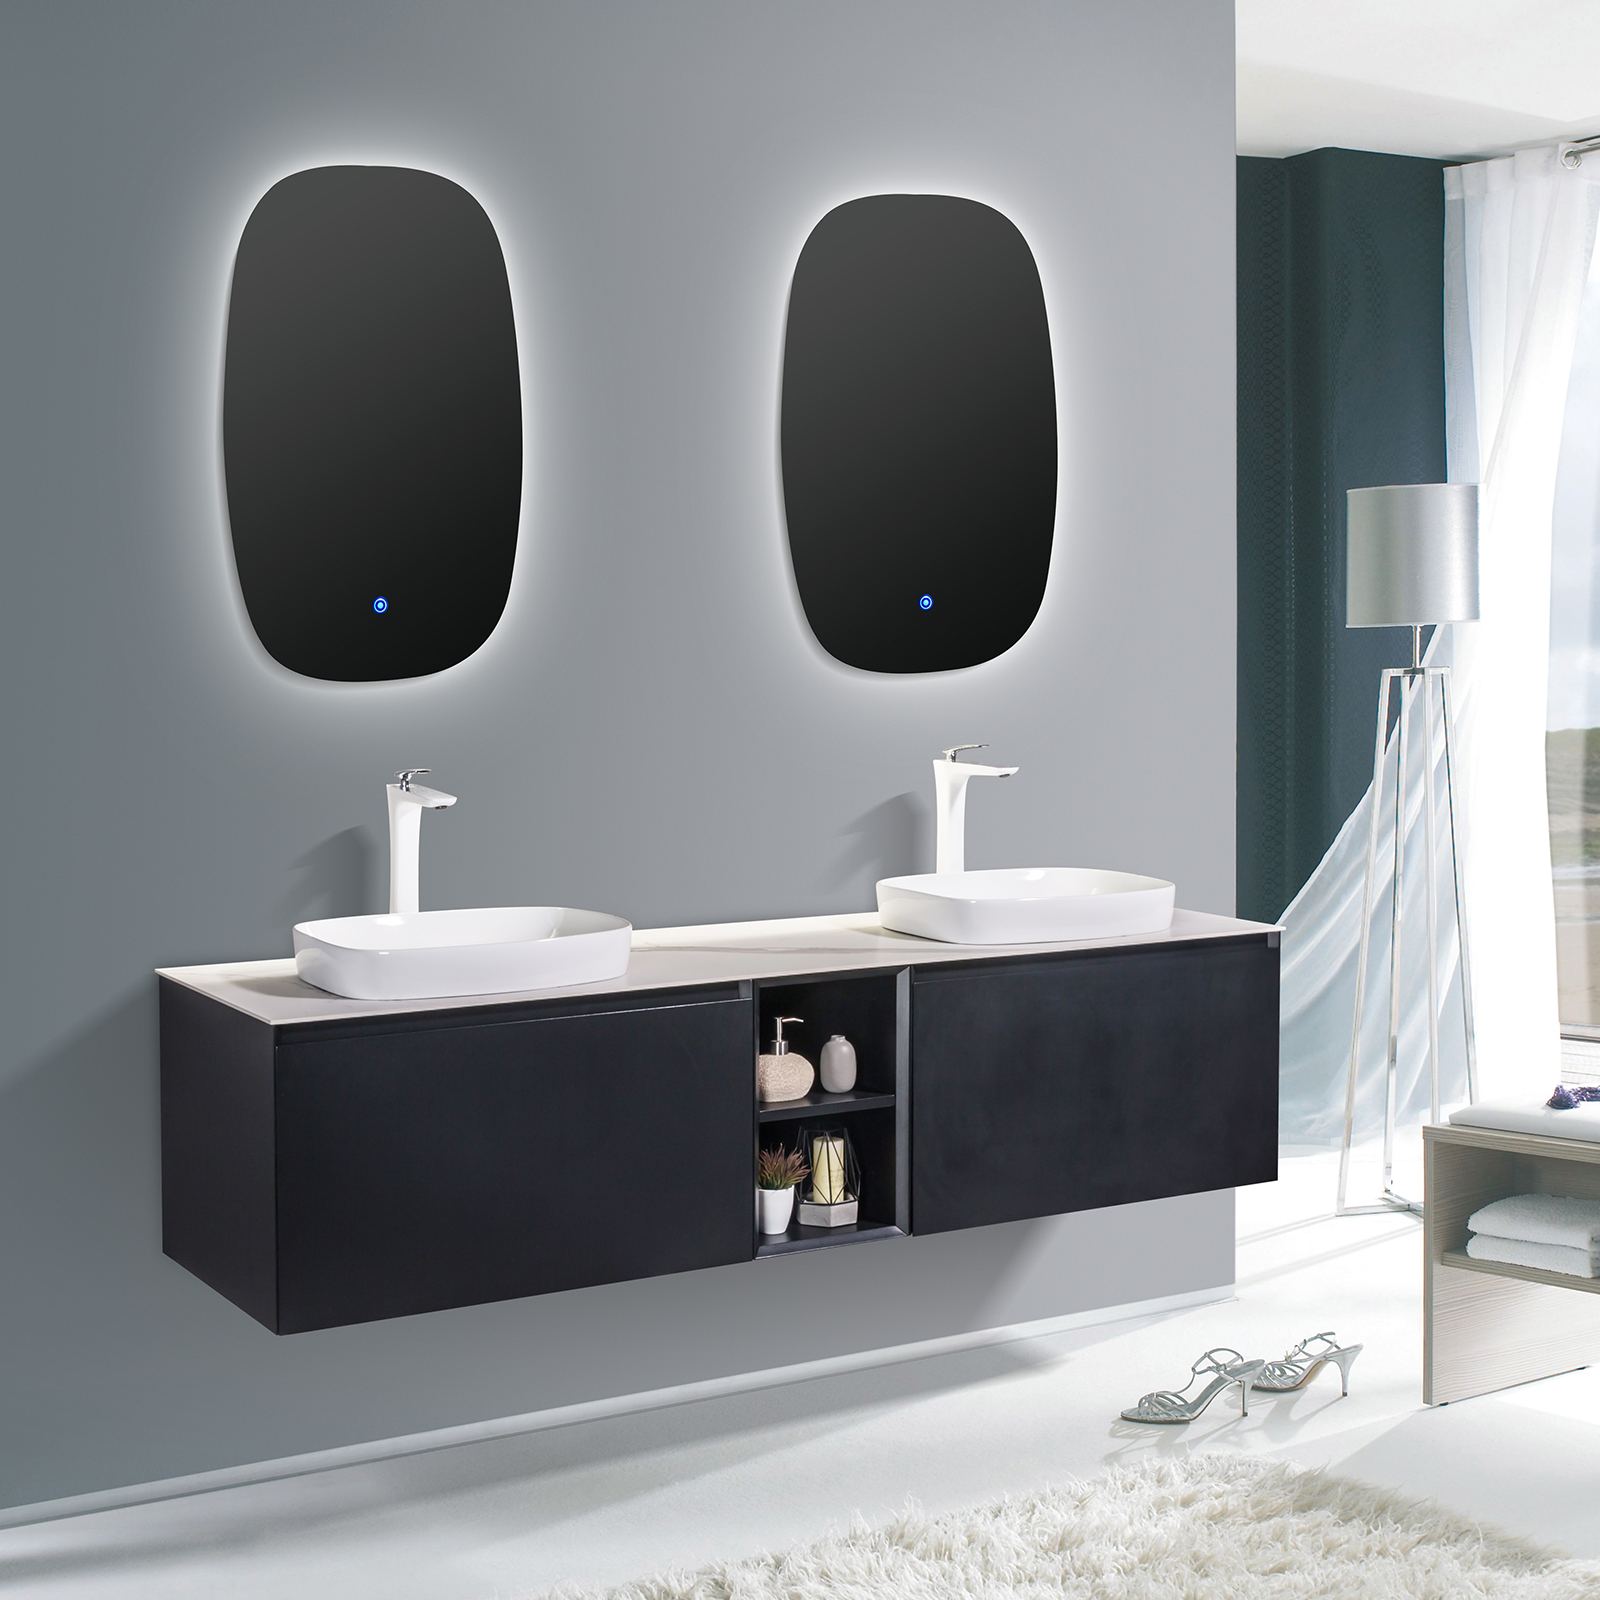 Salle De Bain Revetement ensemble de meubles de salle de bain inalco 1900 noir